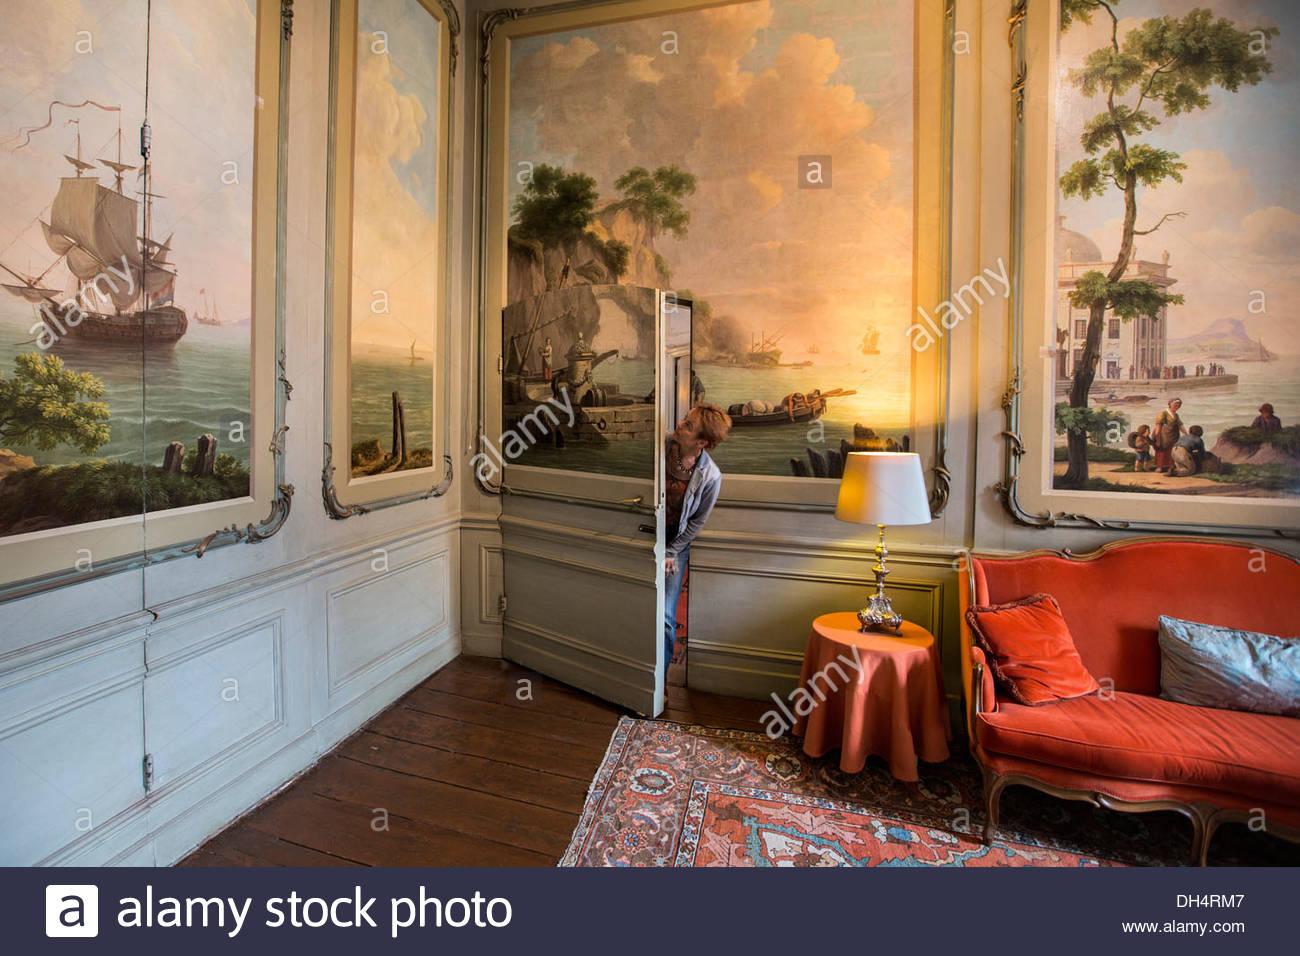 holland museum van loon canal house of amsterdam regent family van